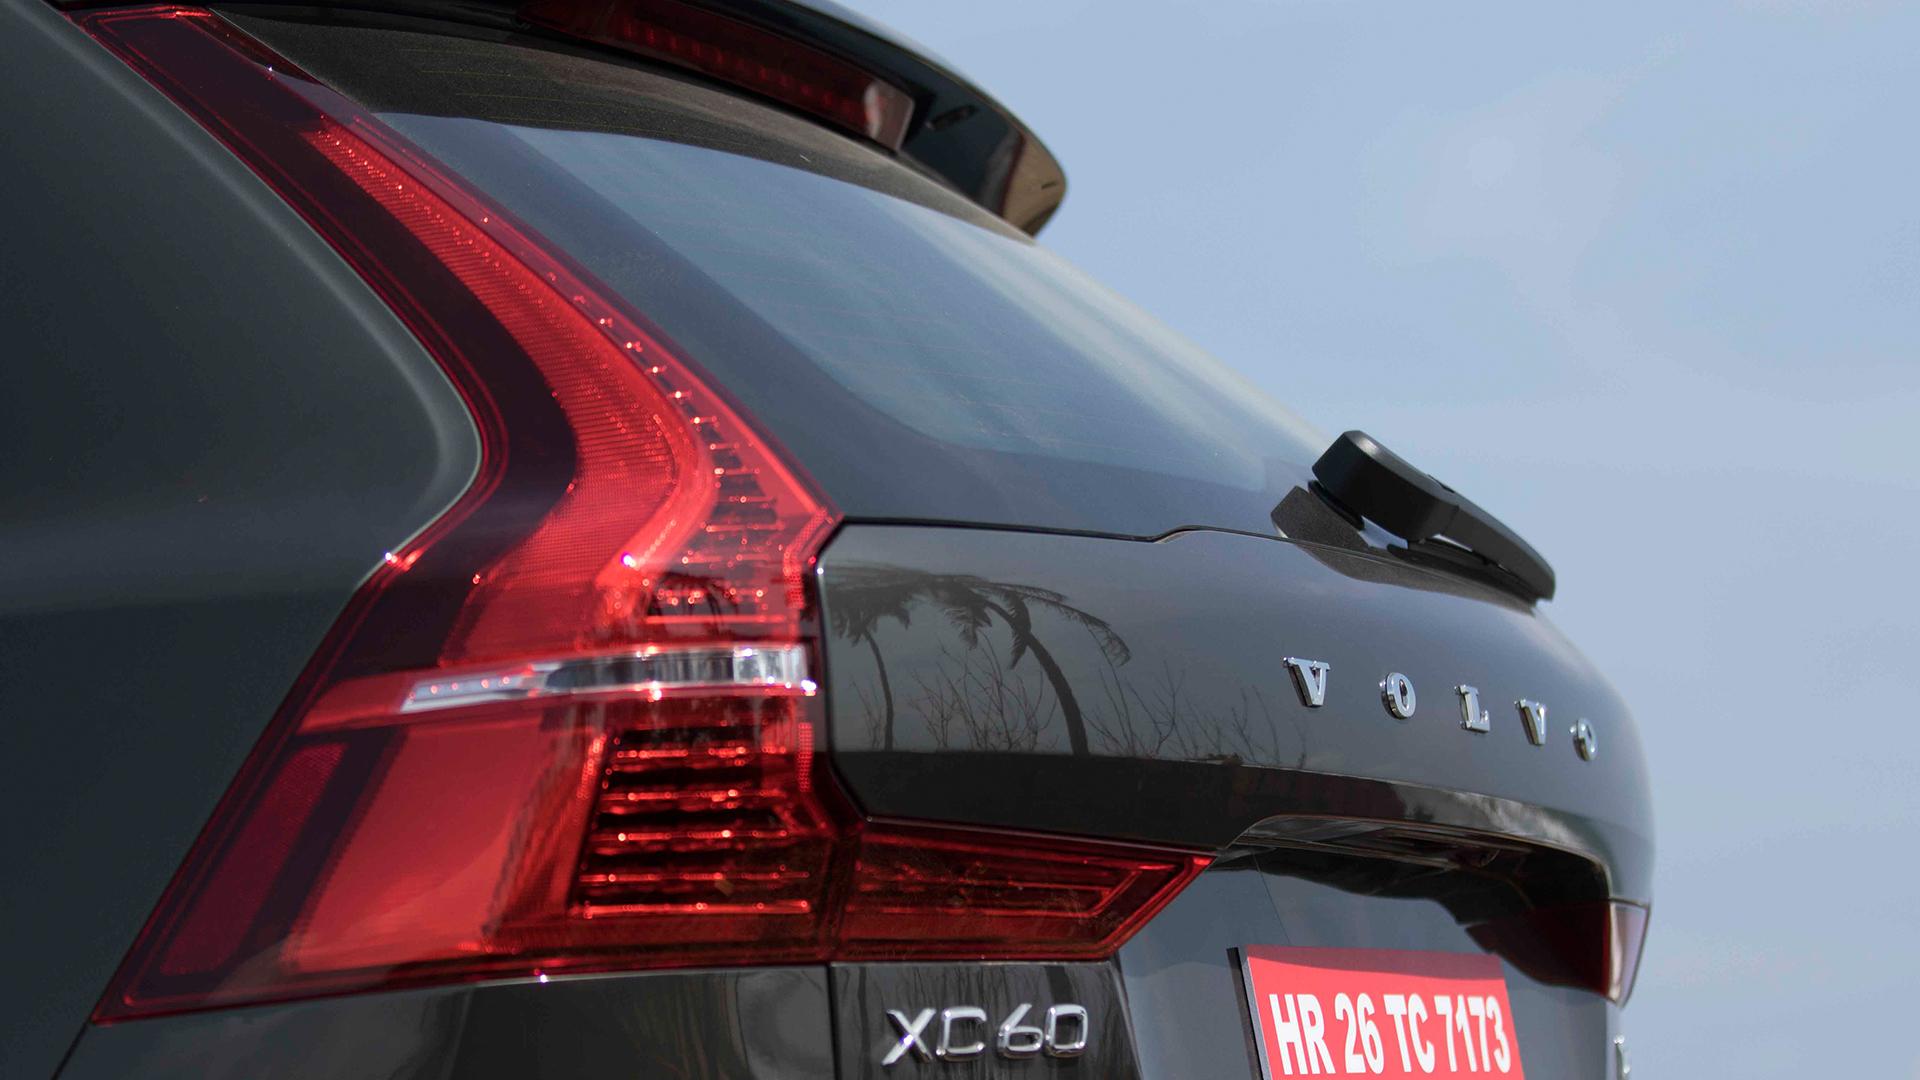 Volvo Xc60 2018 Inscription D5 Price Mileage Reviews